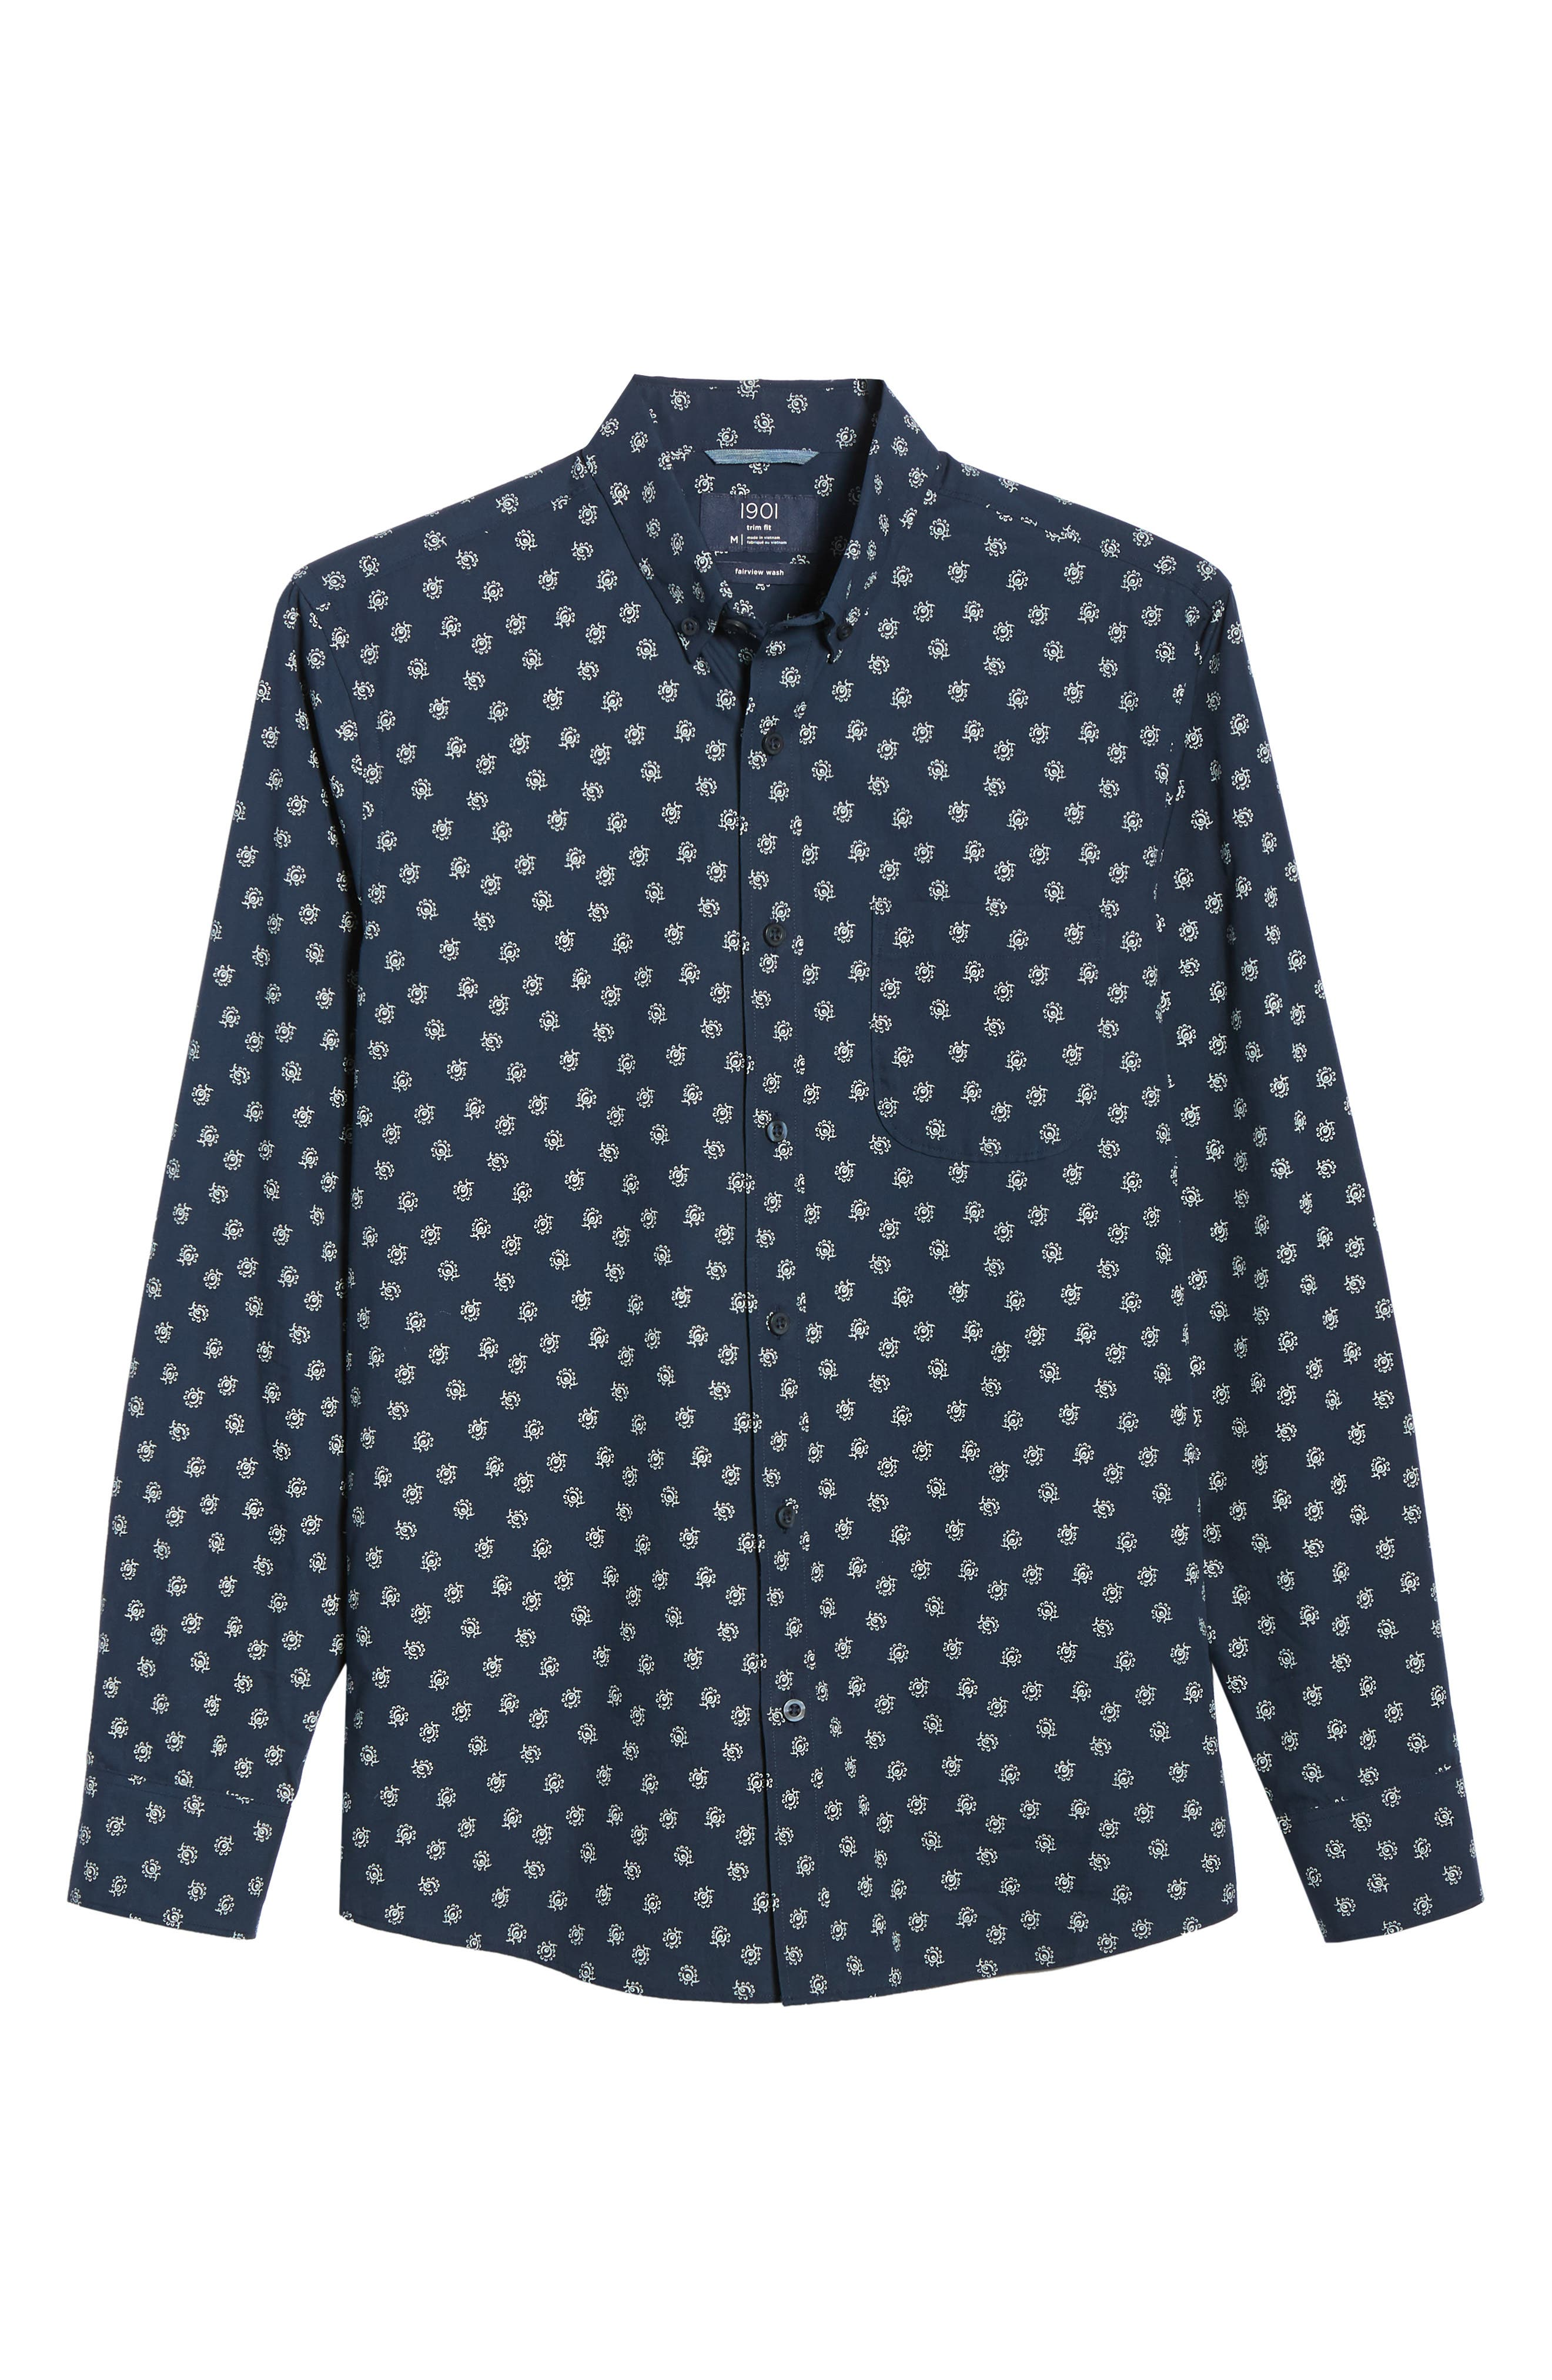 Floral Print Sport Shirt,                             Alternate thumbnail 5, color,                             NAVY IRIS FLORAL PRINT